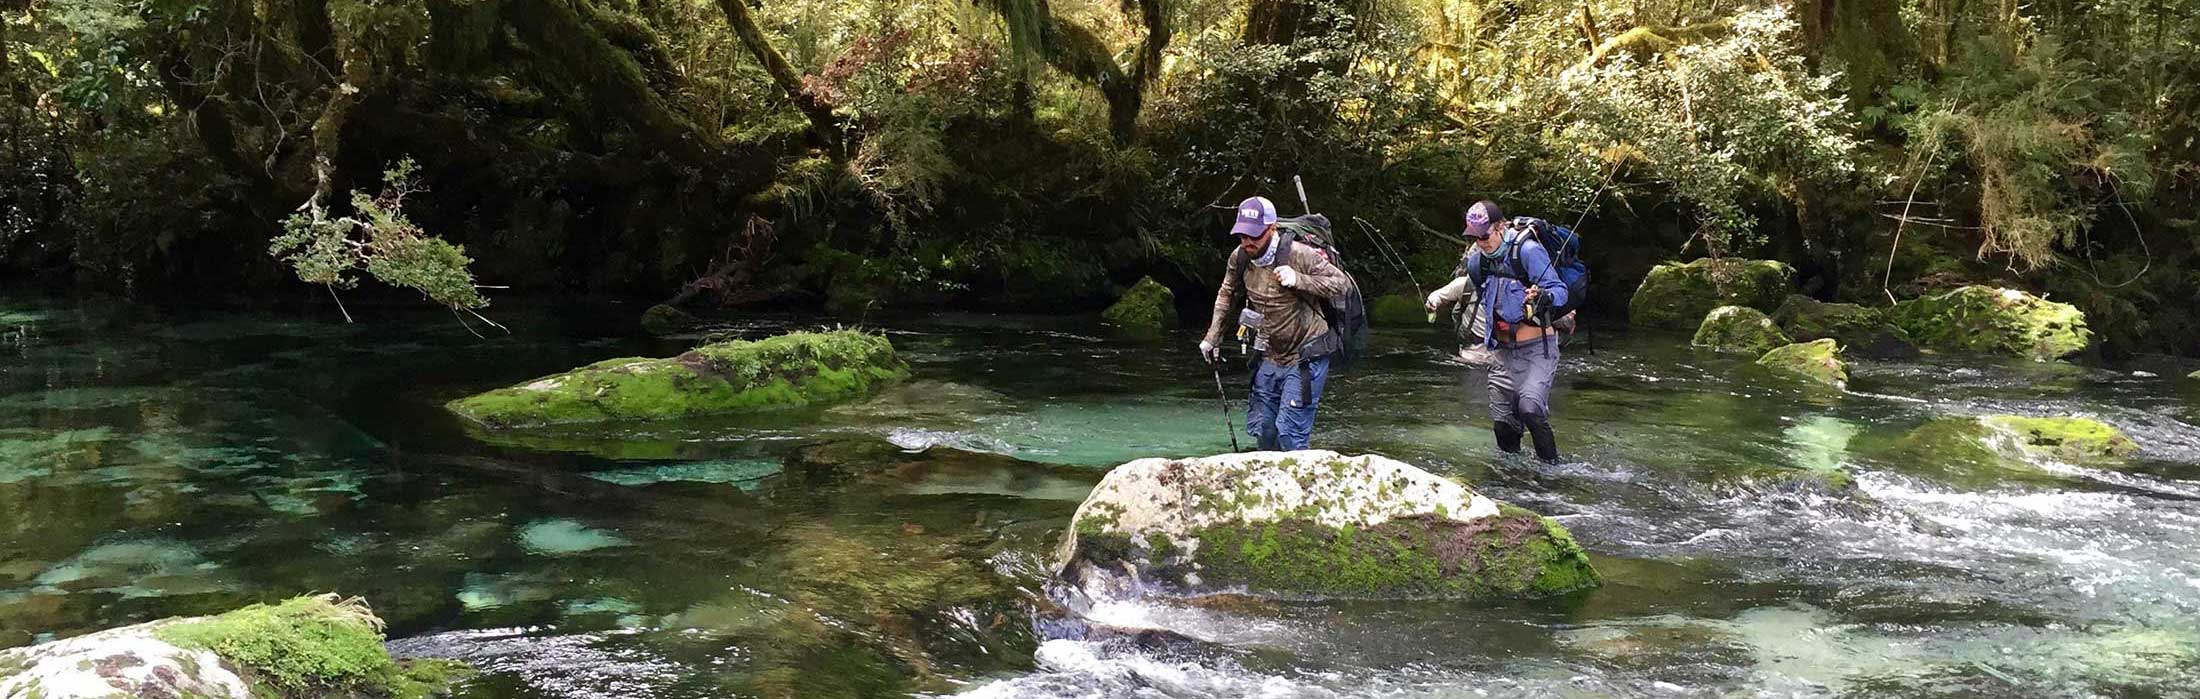 Guided-Fishing.jpg